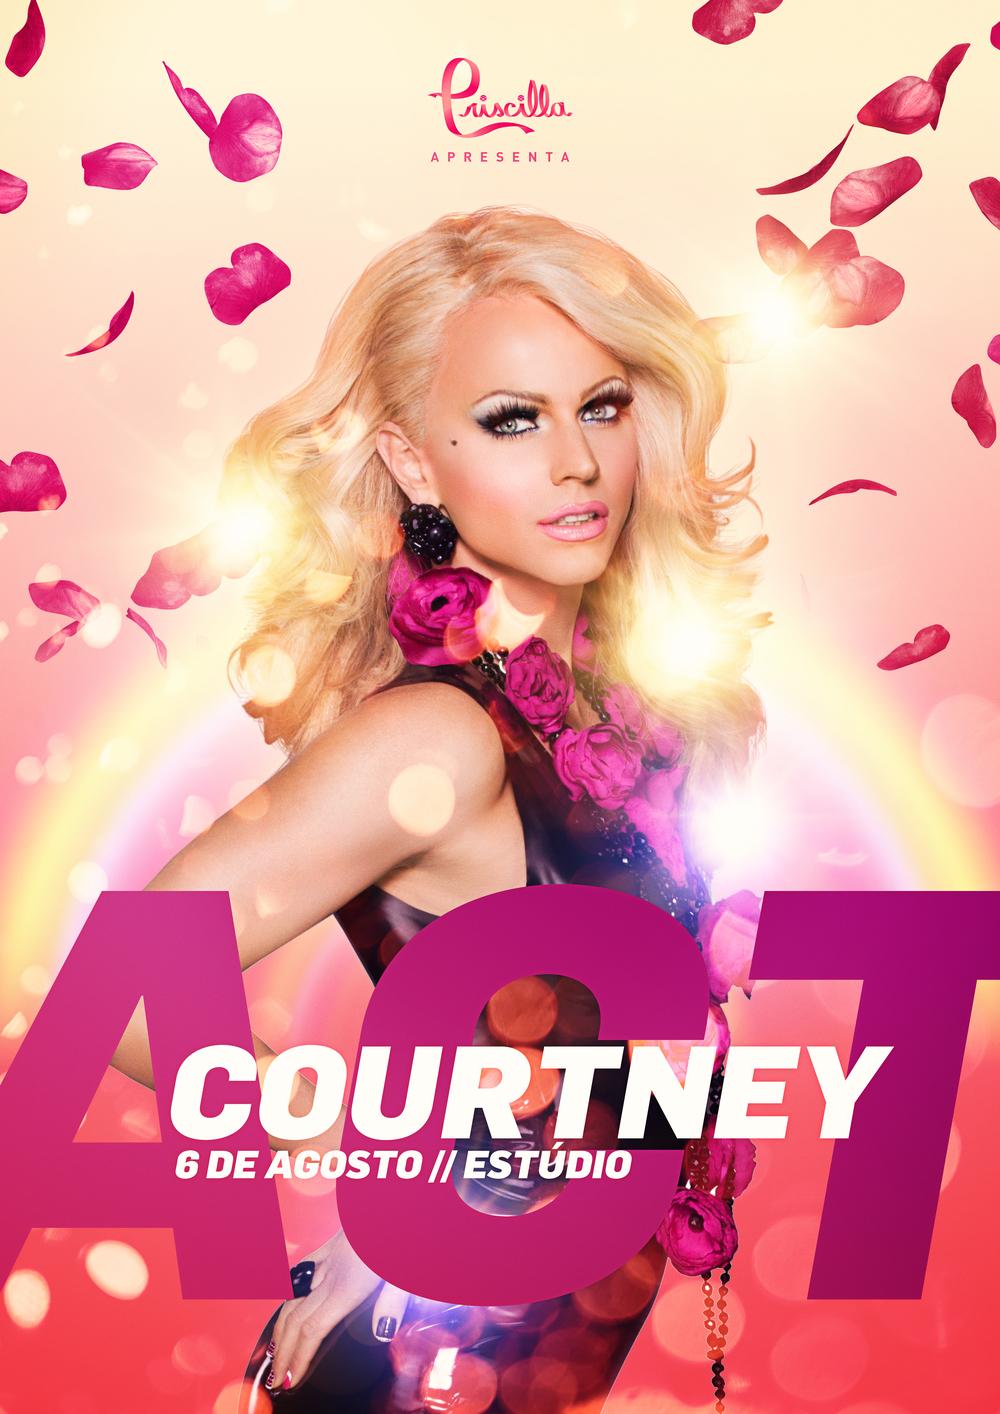 CourtneyAct_2.jpg